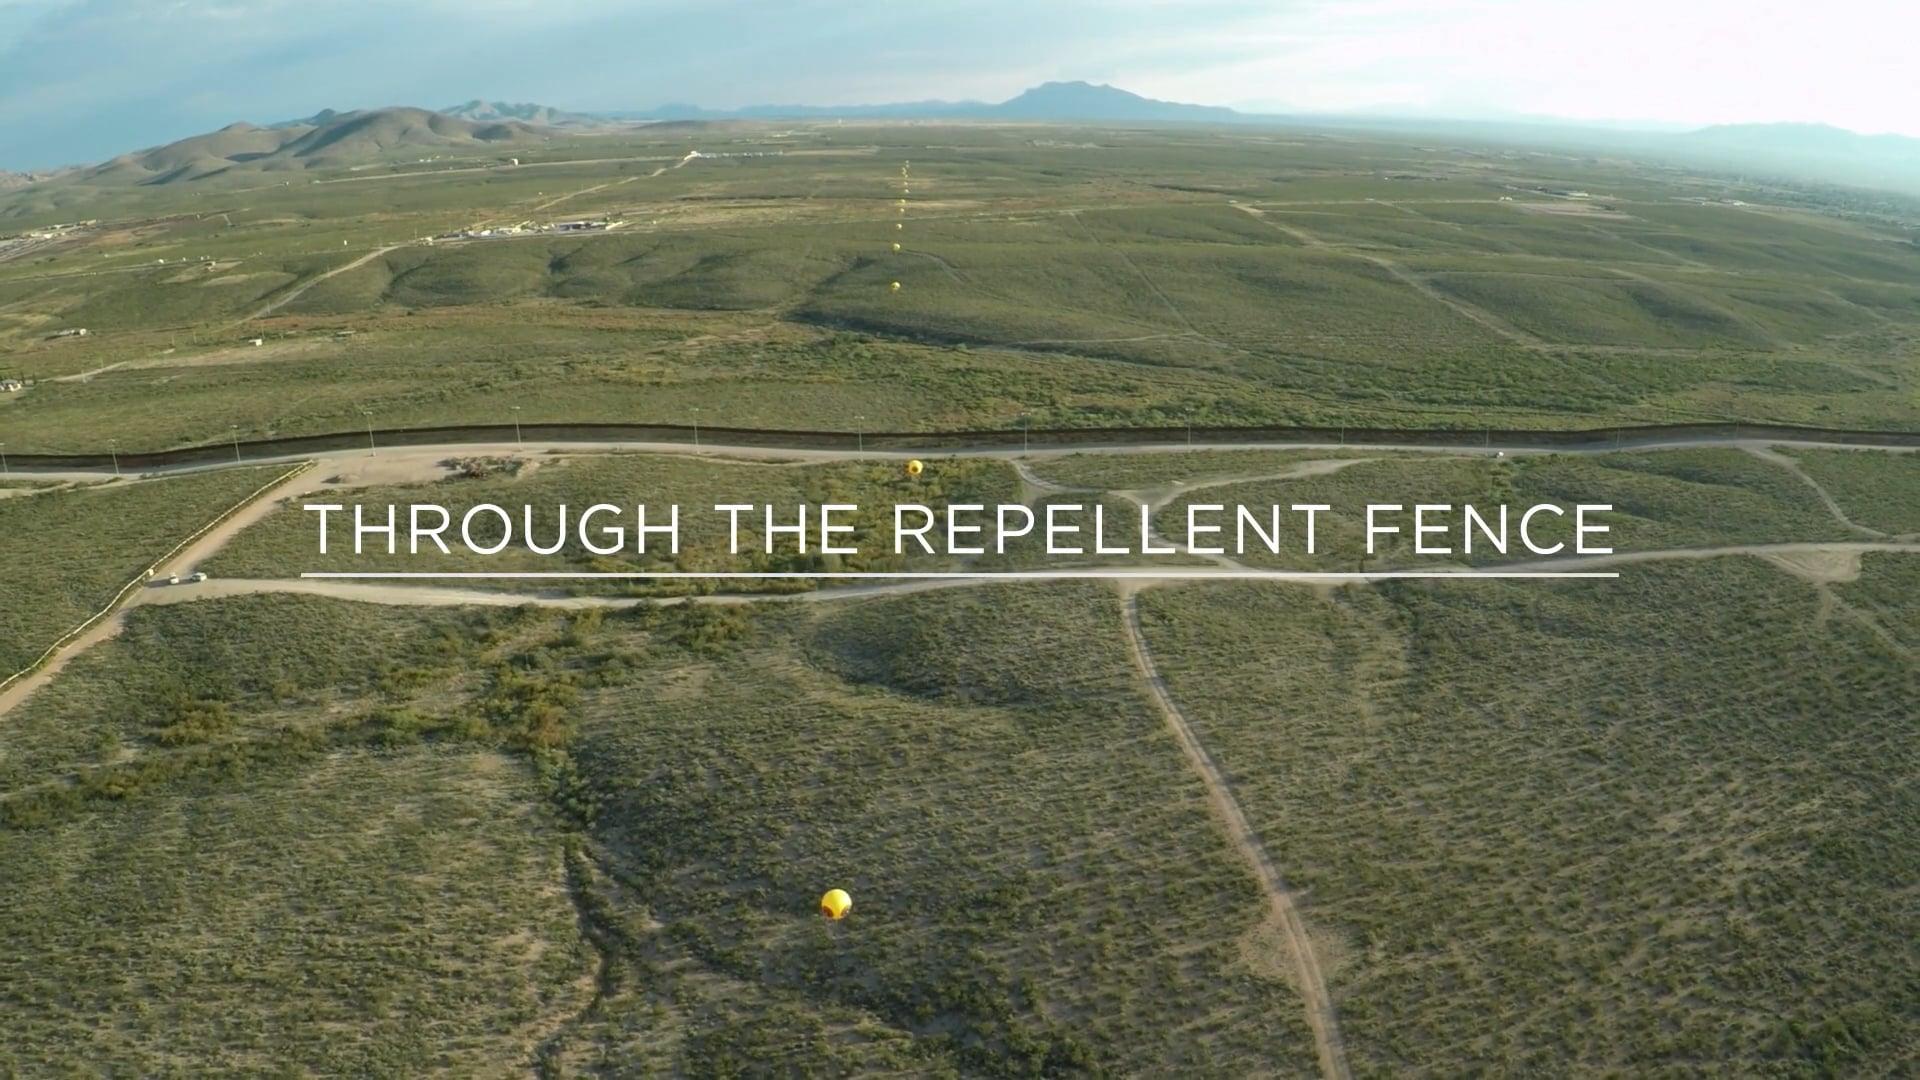 THROUGH THE REPELLENT FENCE - Film Trailer